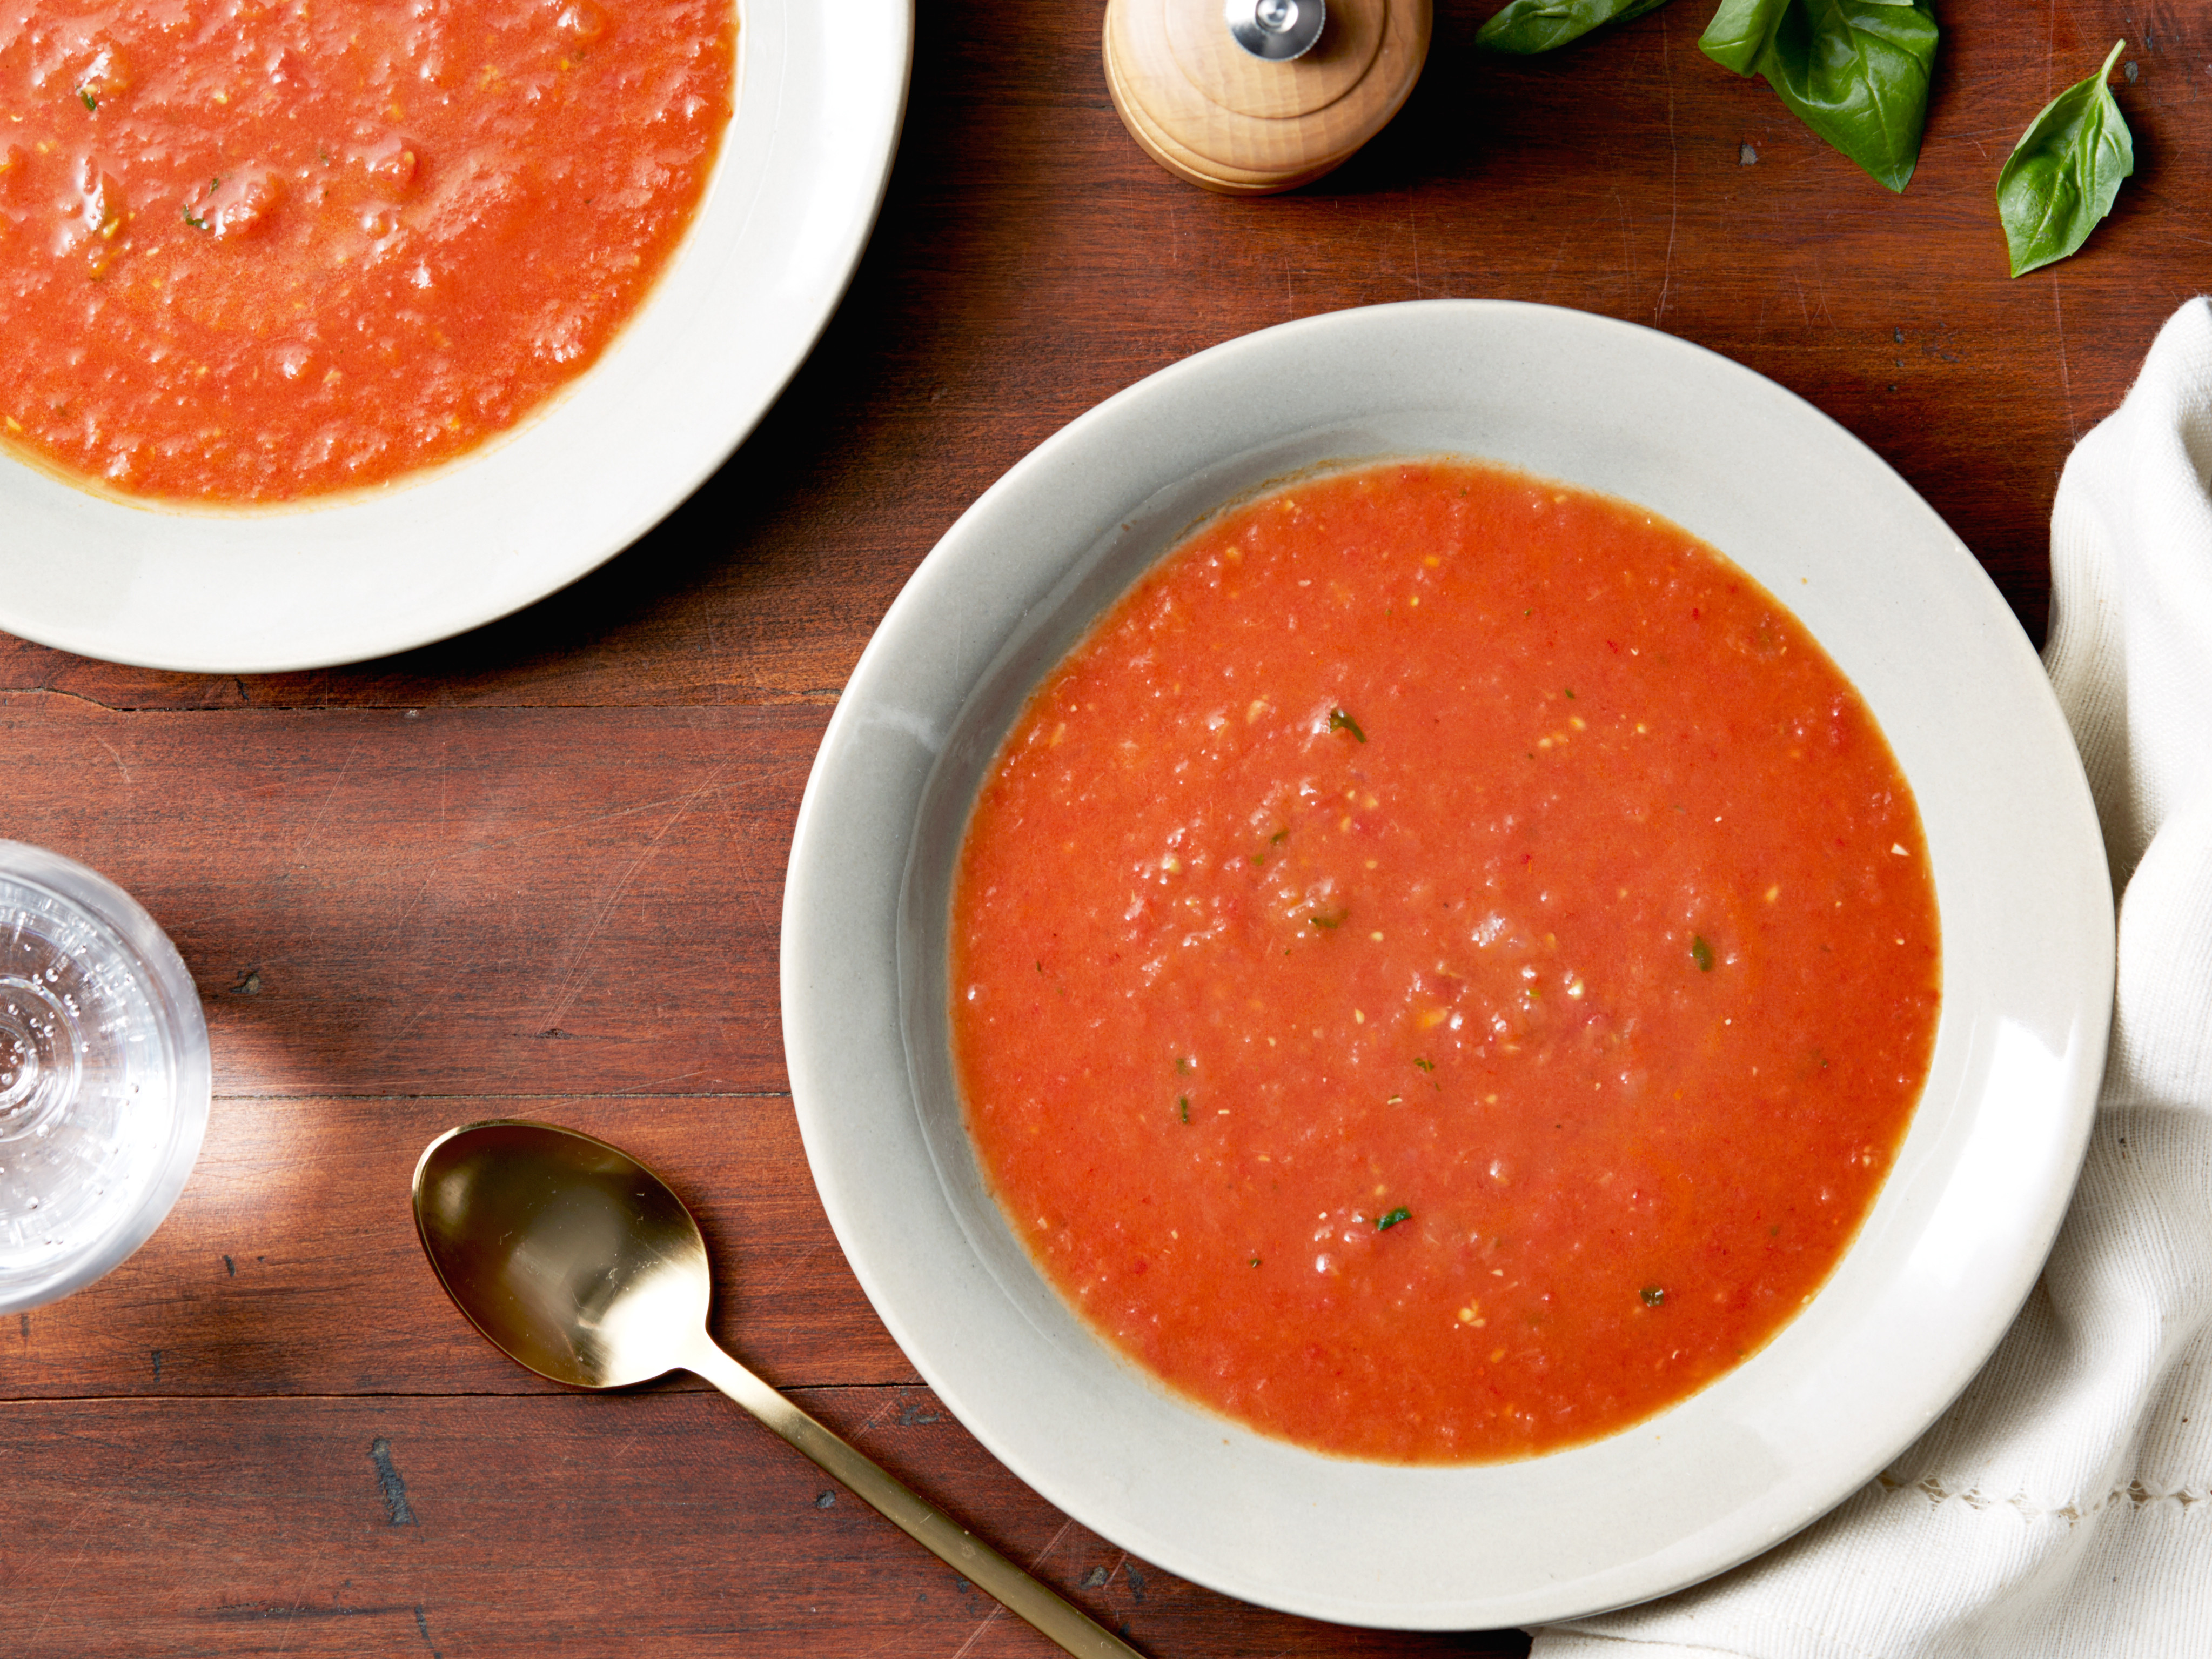 Ina Garten Tomato Soup  Roasted Tomato Basil Soup Recipe Ina Garten Food Network